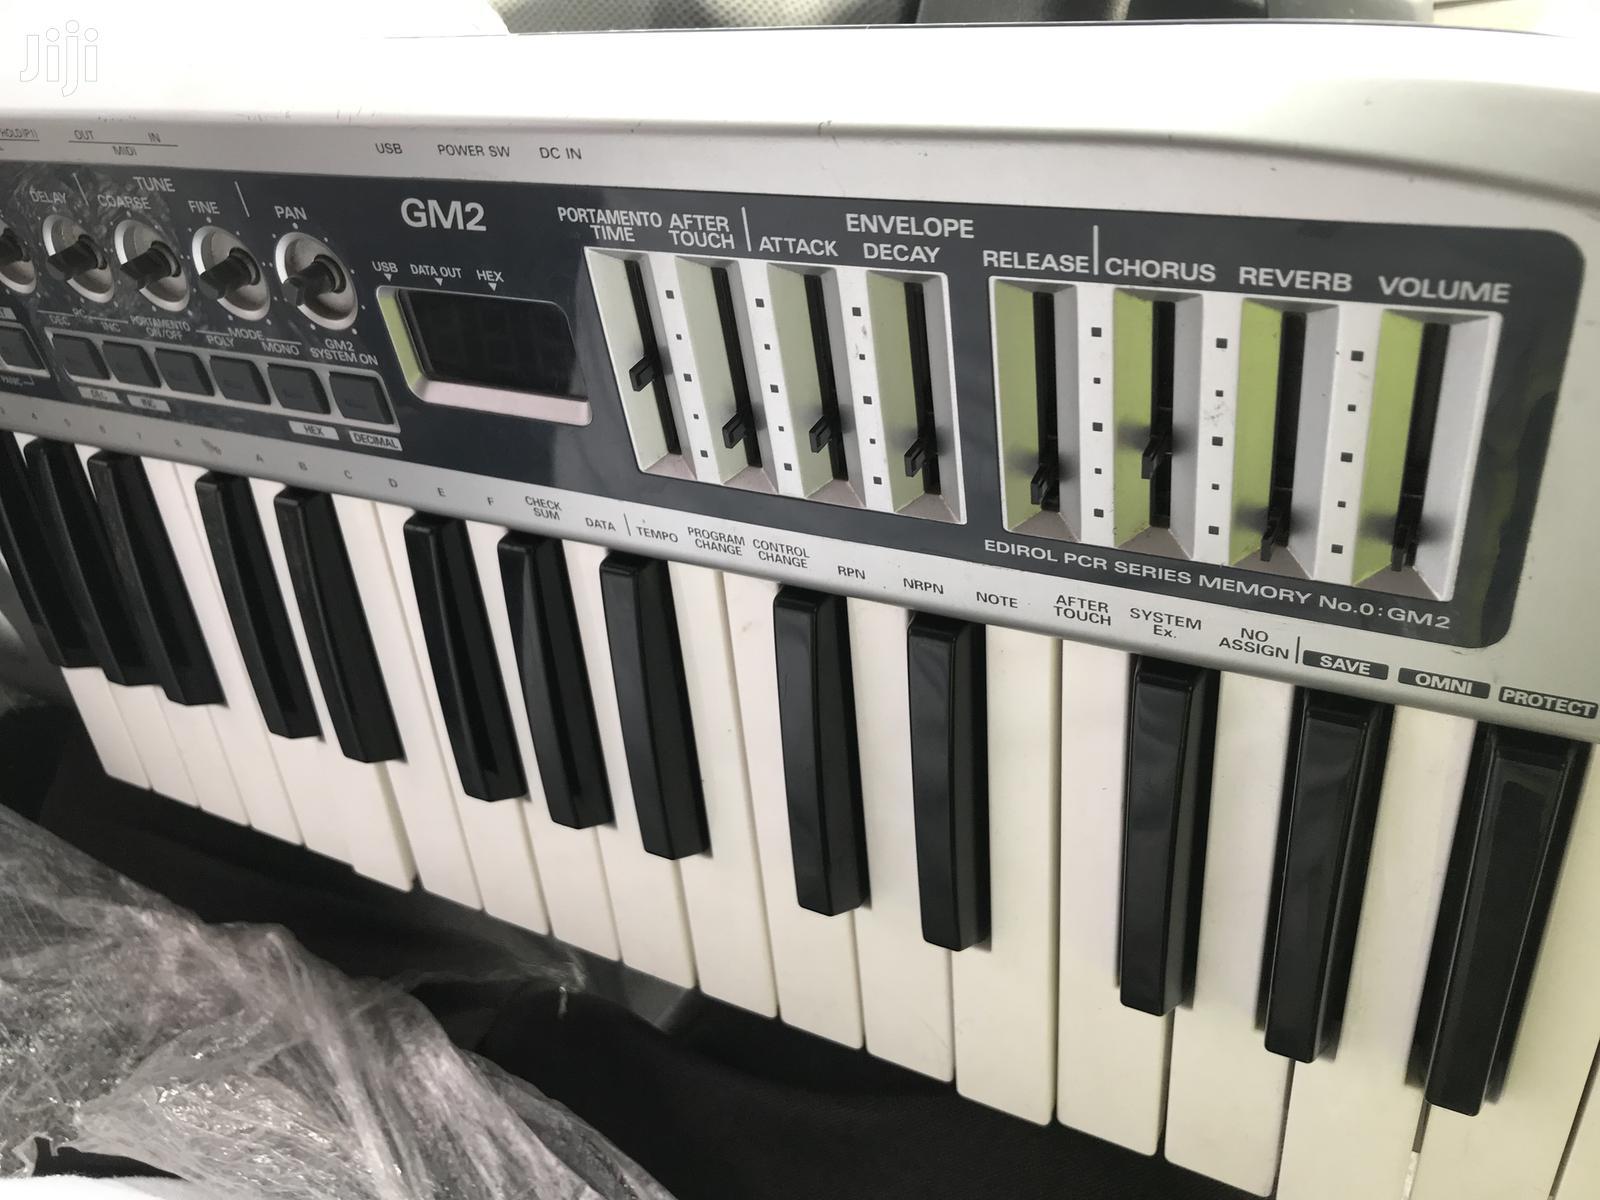 Edirol Midi PCR30 | Musical Instruments & Gear for sale in Accra Metropolitan, Greater Accra, Ghana